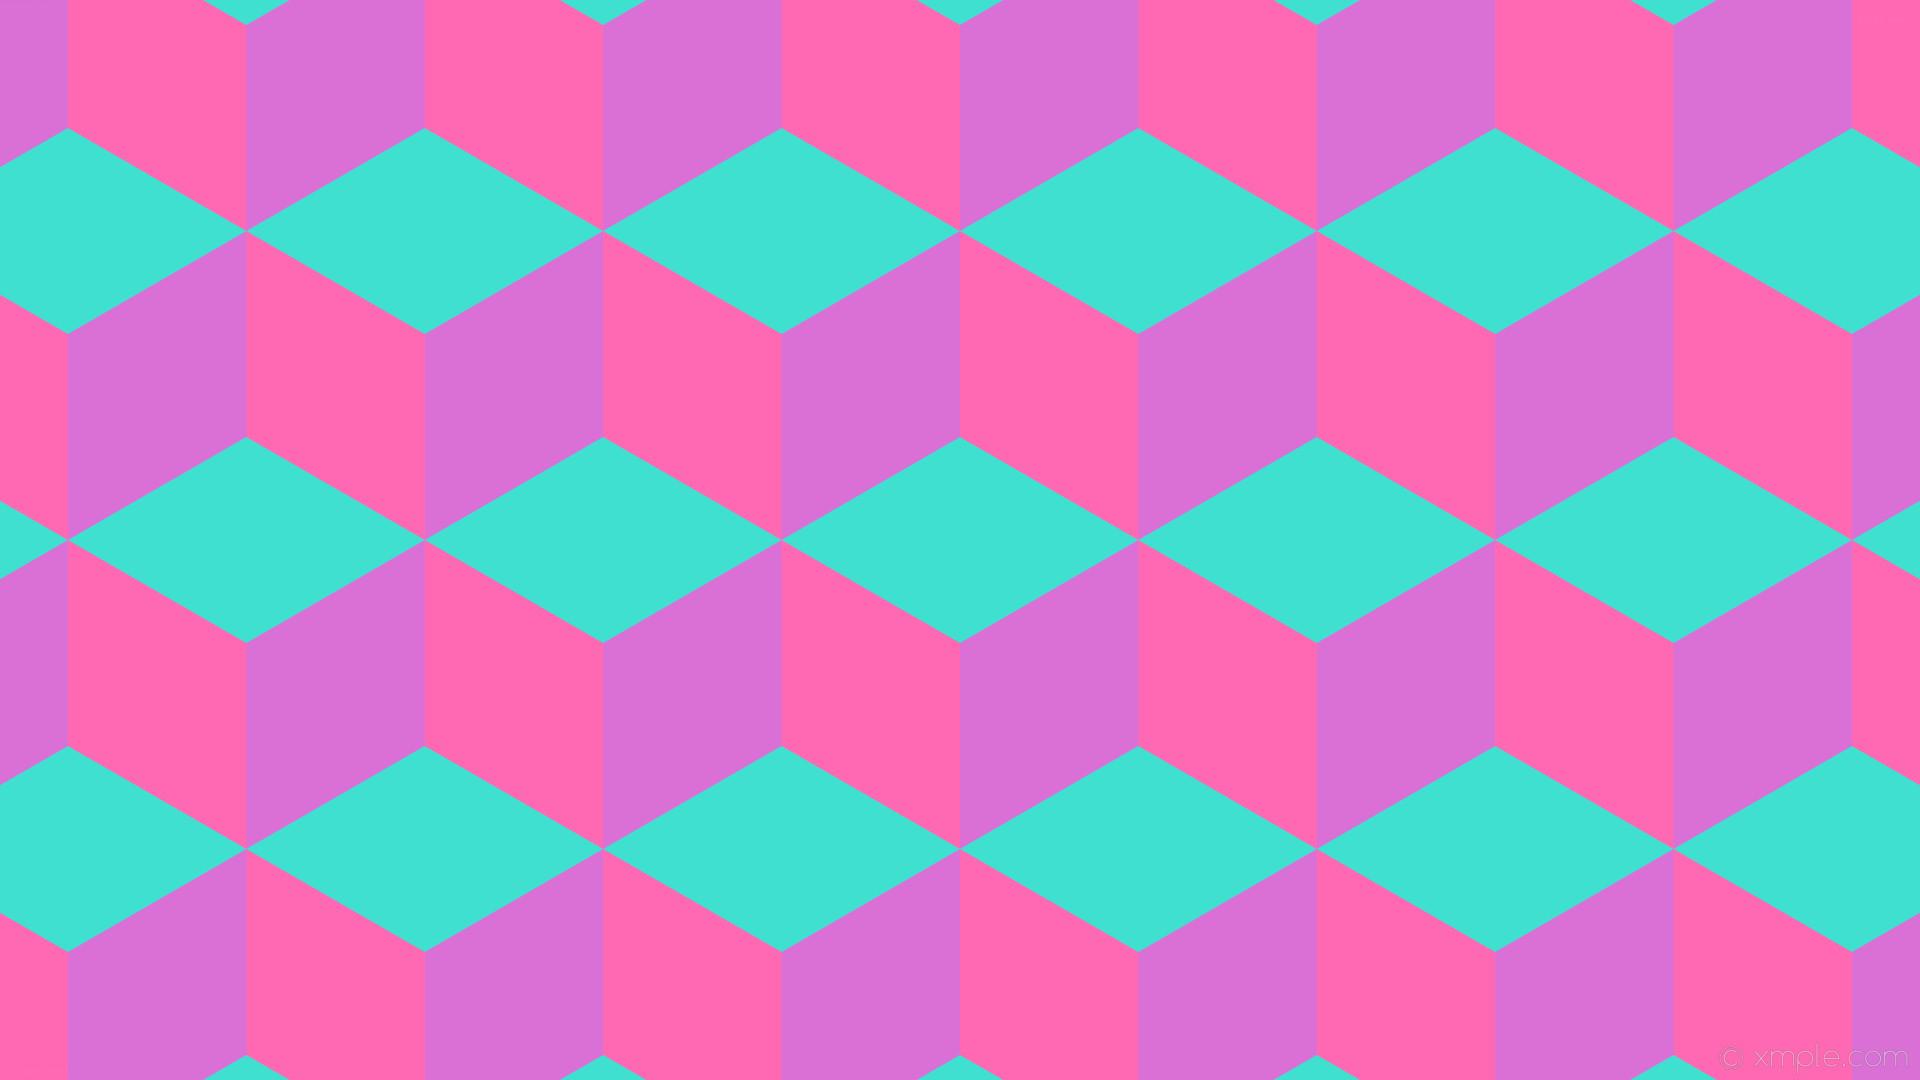 wallpaper purple blue pink 3d cubes turquoise hot pink orchid #40e0d0  #ff69b4 #da70d6